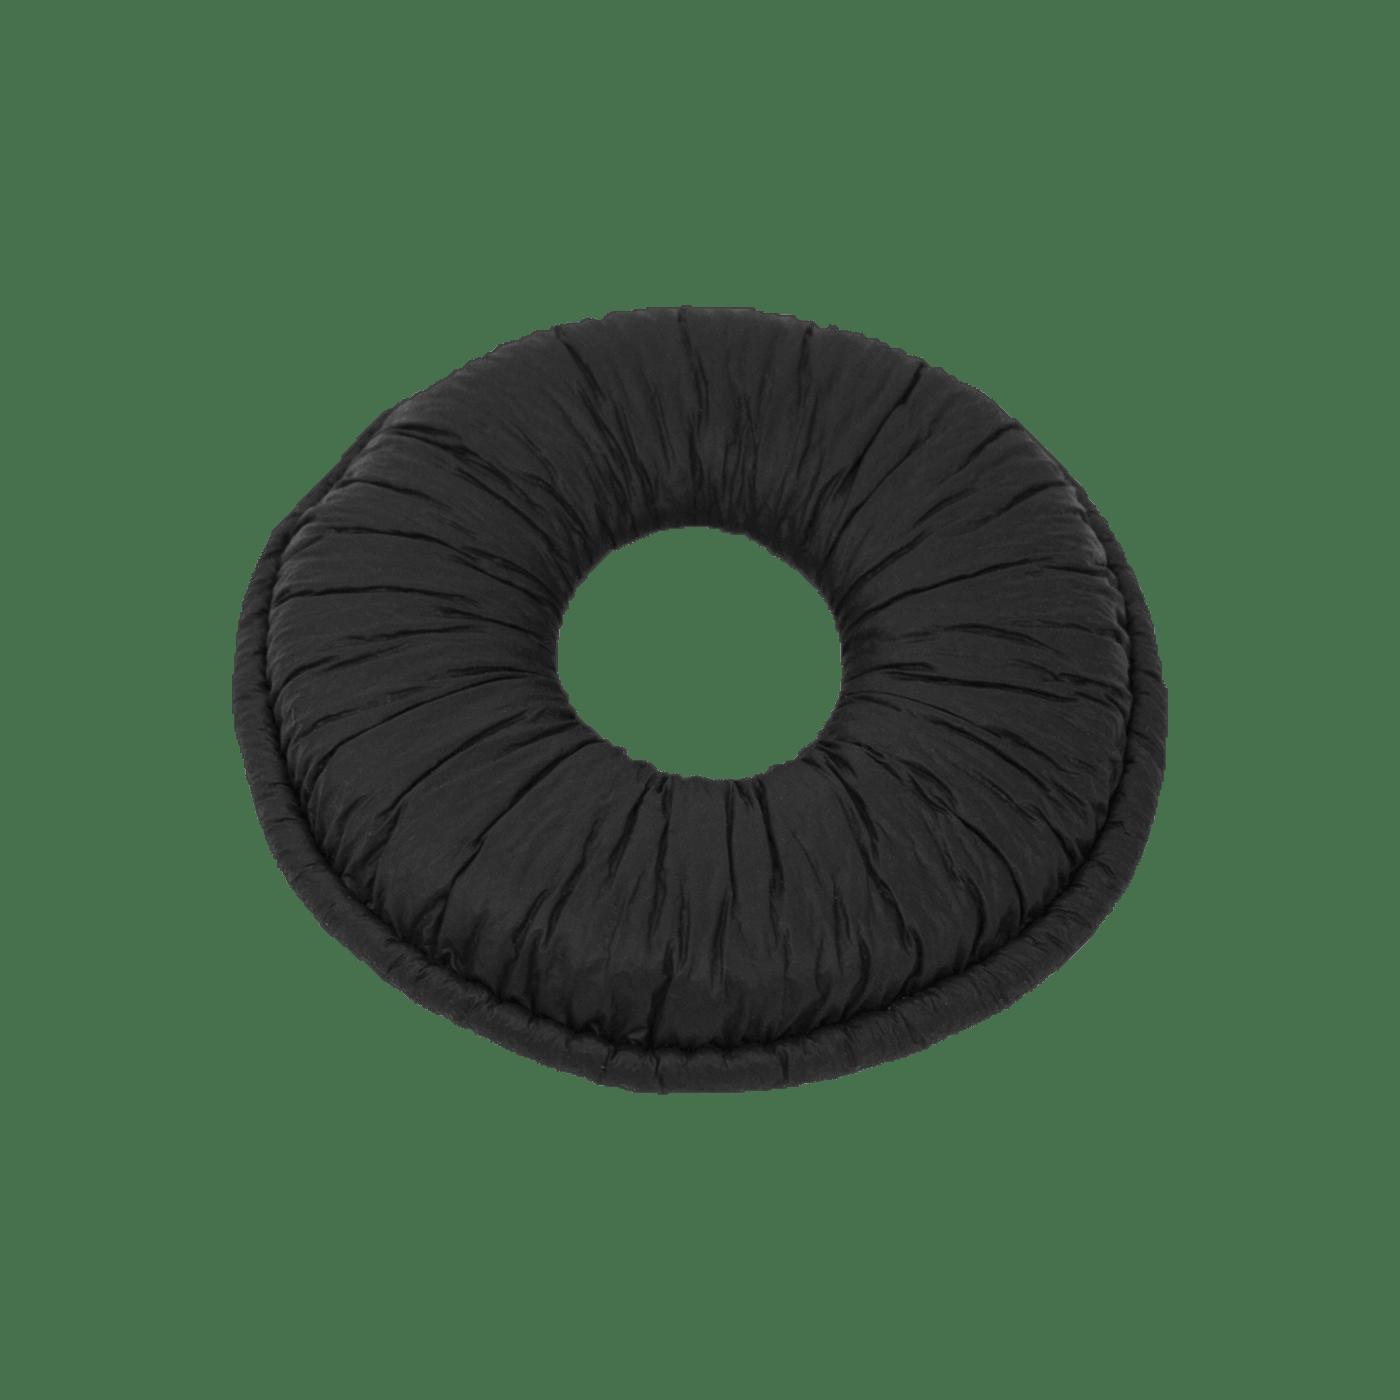 Jabra Leather Ear Cushions